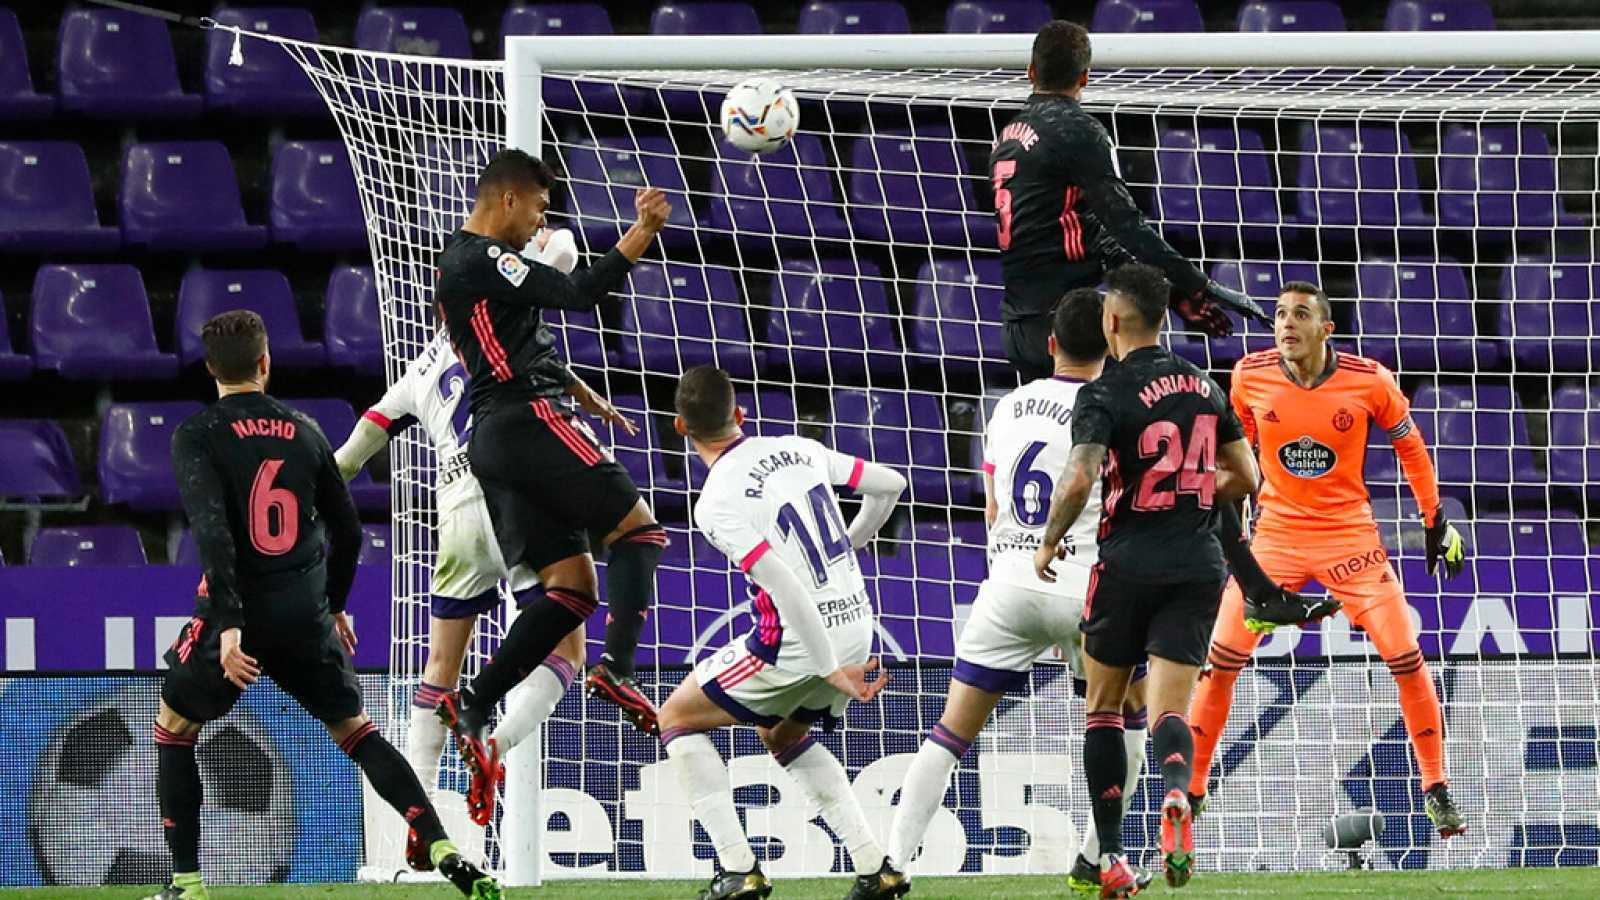 Tablero deportivo - El Real Madrid aprieta la lucha por la Liga - Escuchar ahora